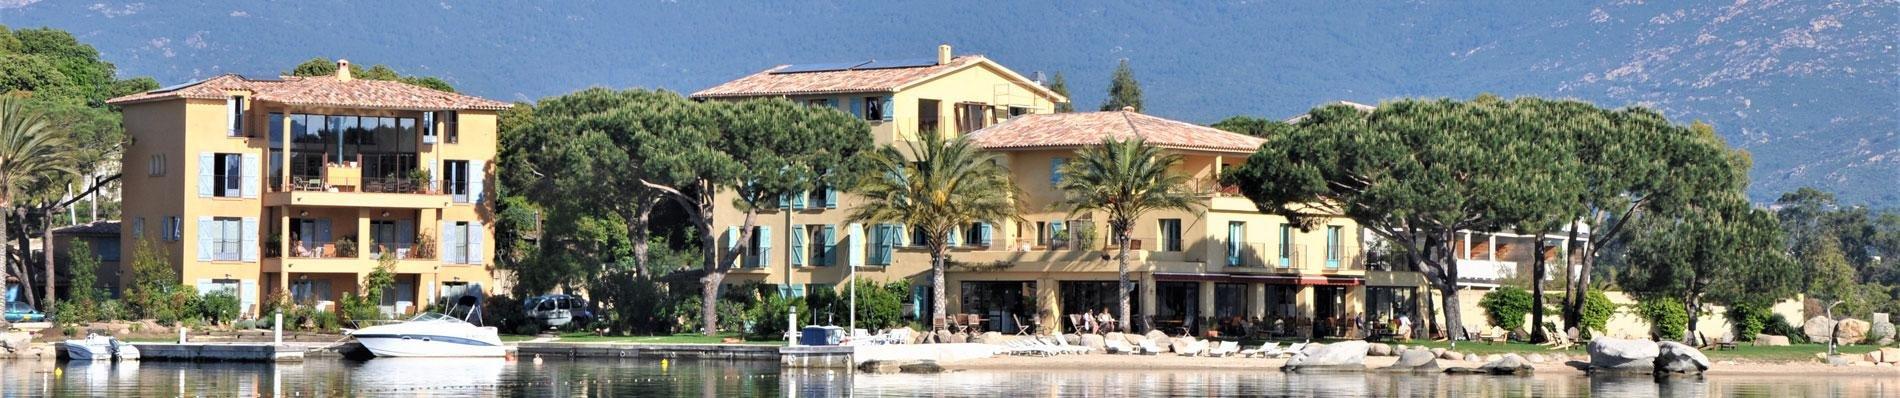 hotel le goeland corse corsica hotel aan zee porto vecchio